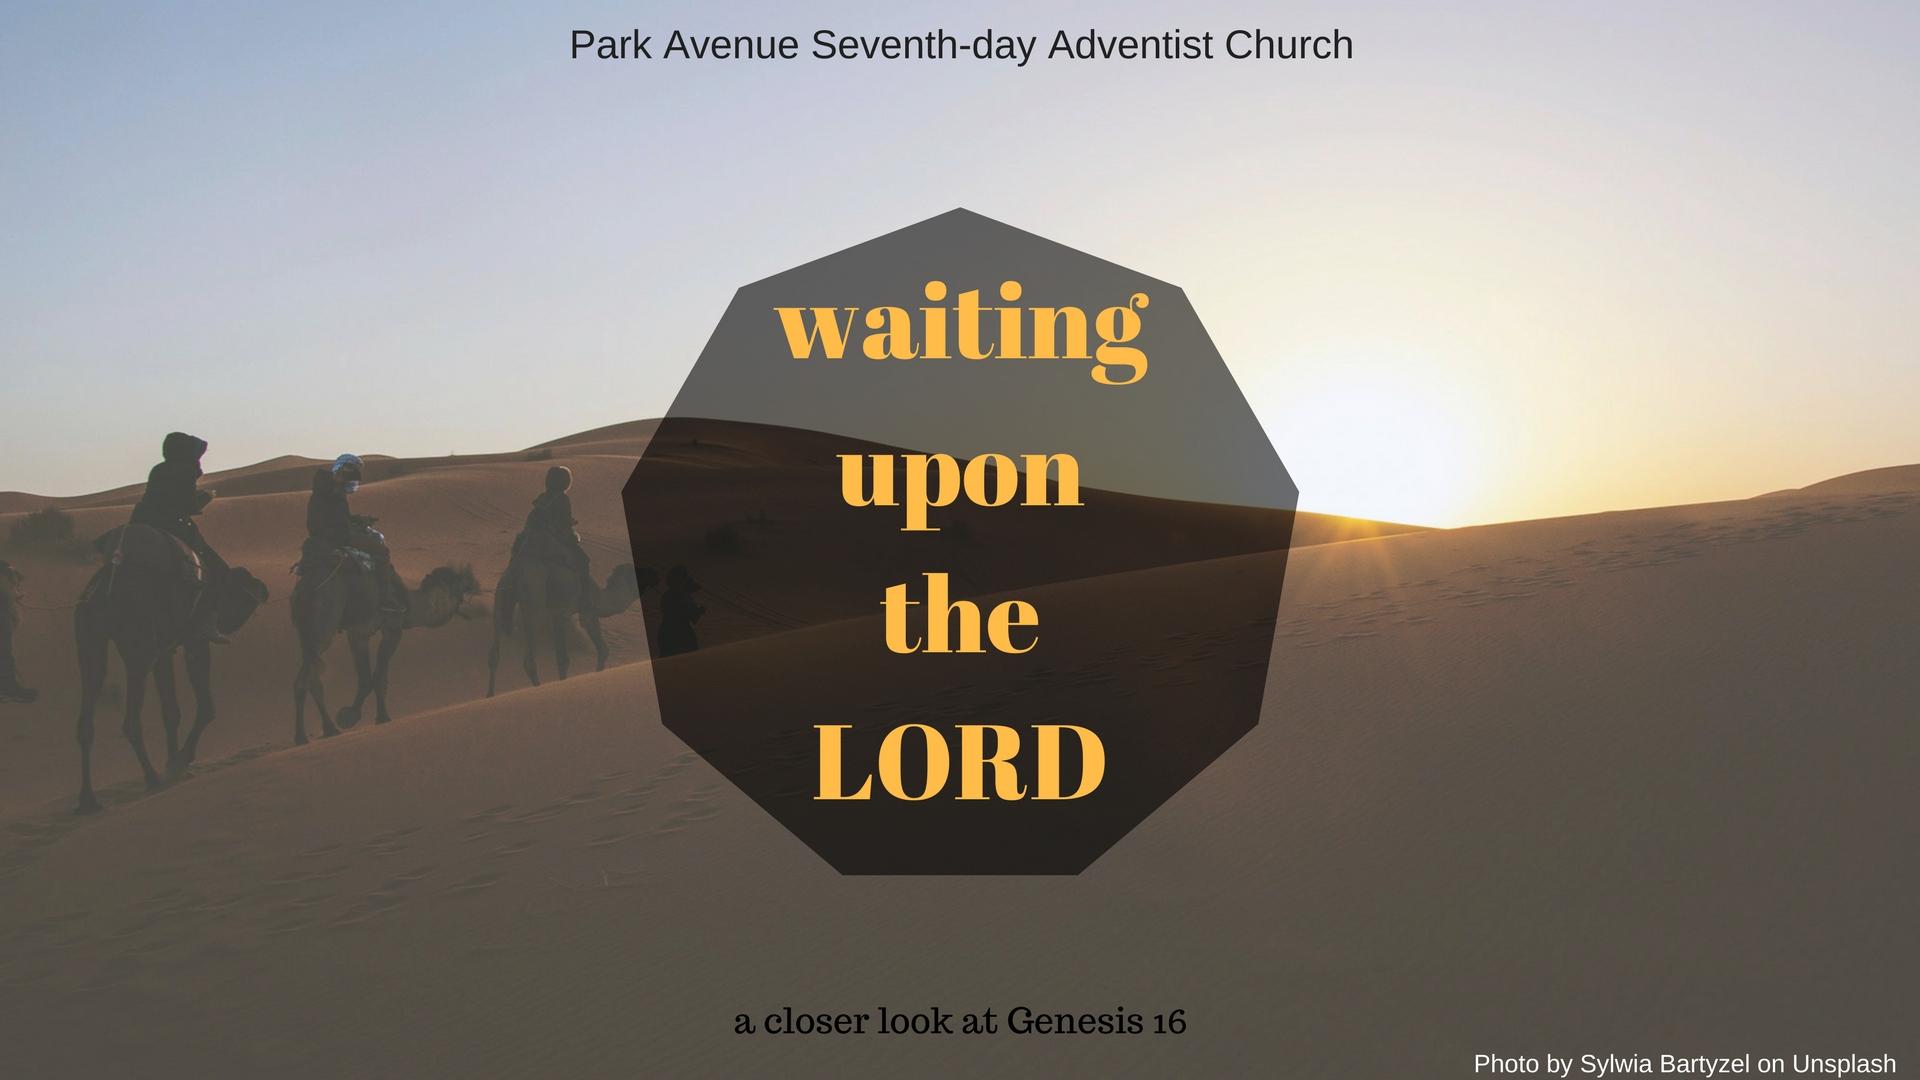 waitinguponthe LORD.jpg